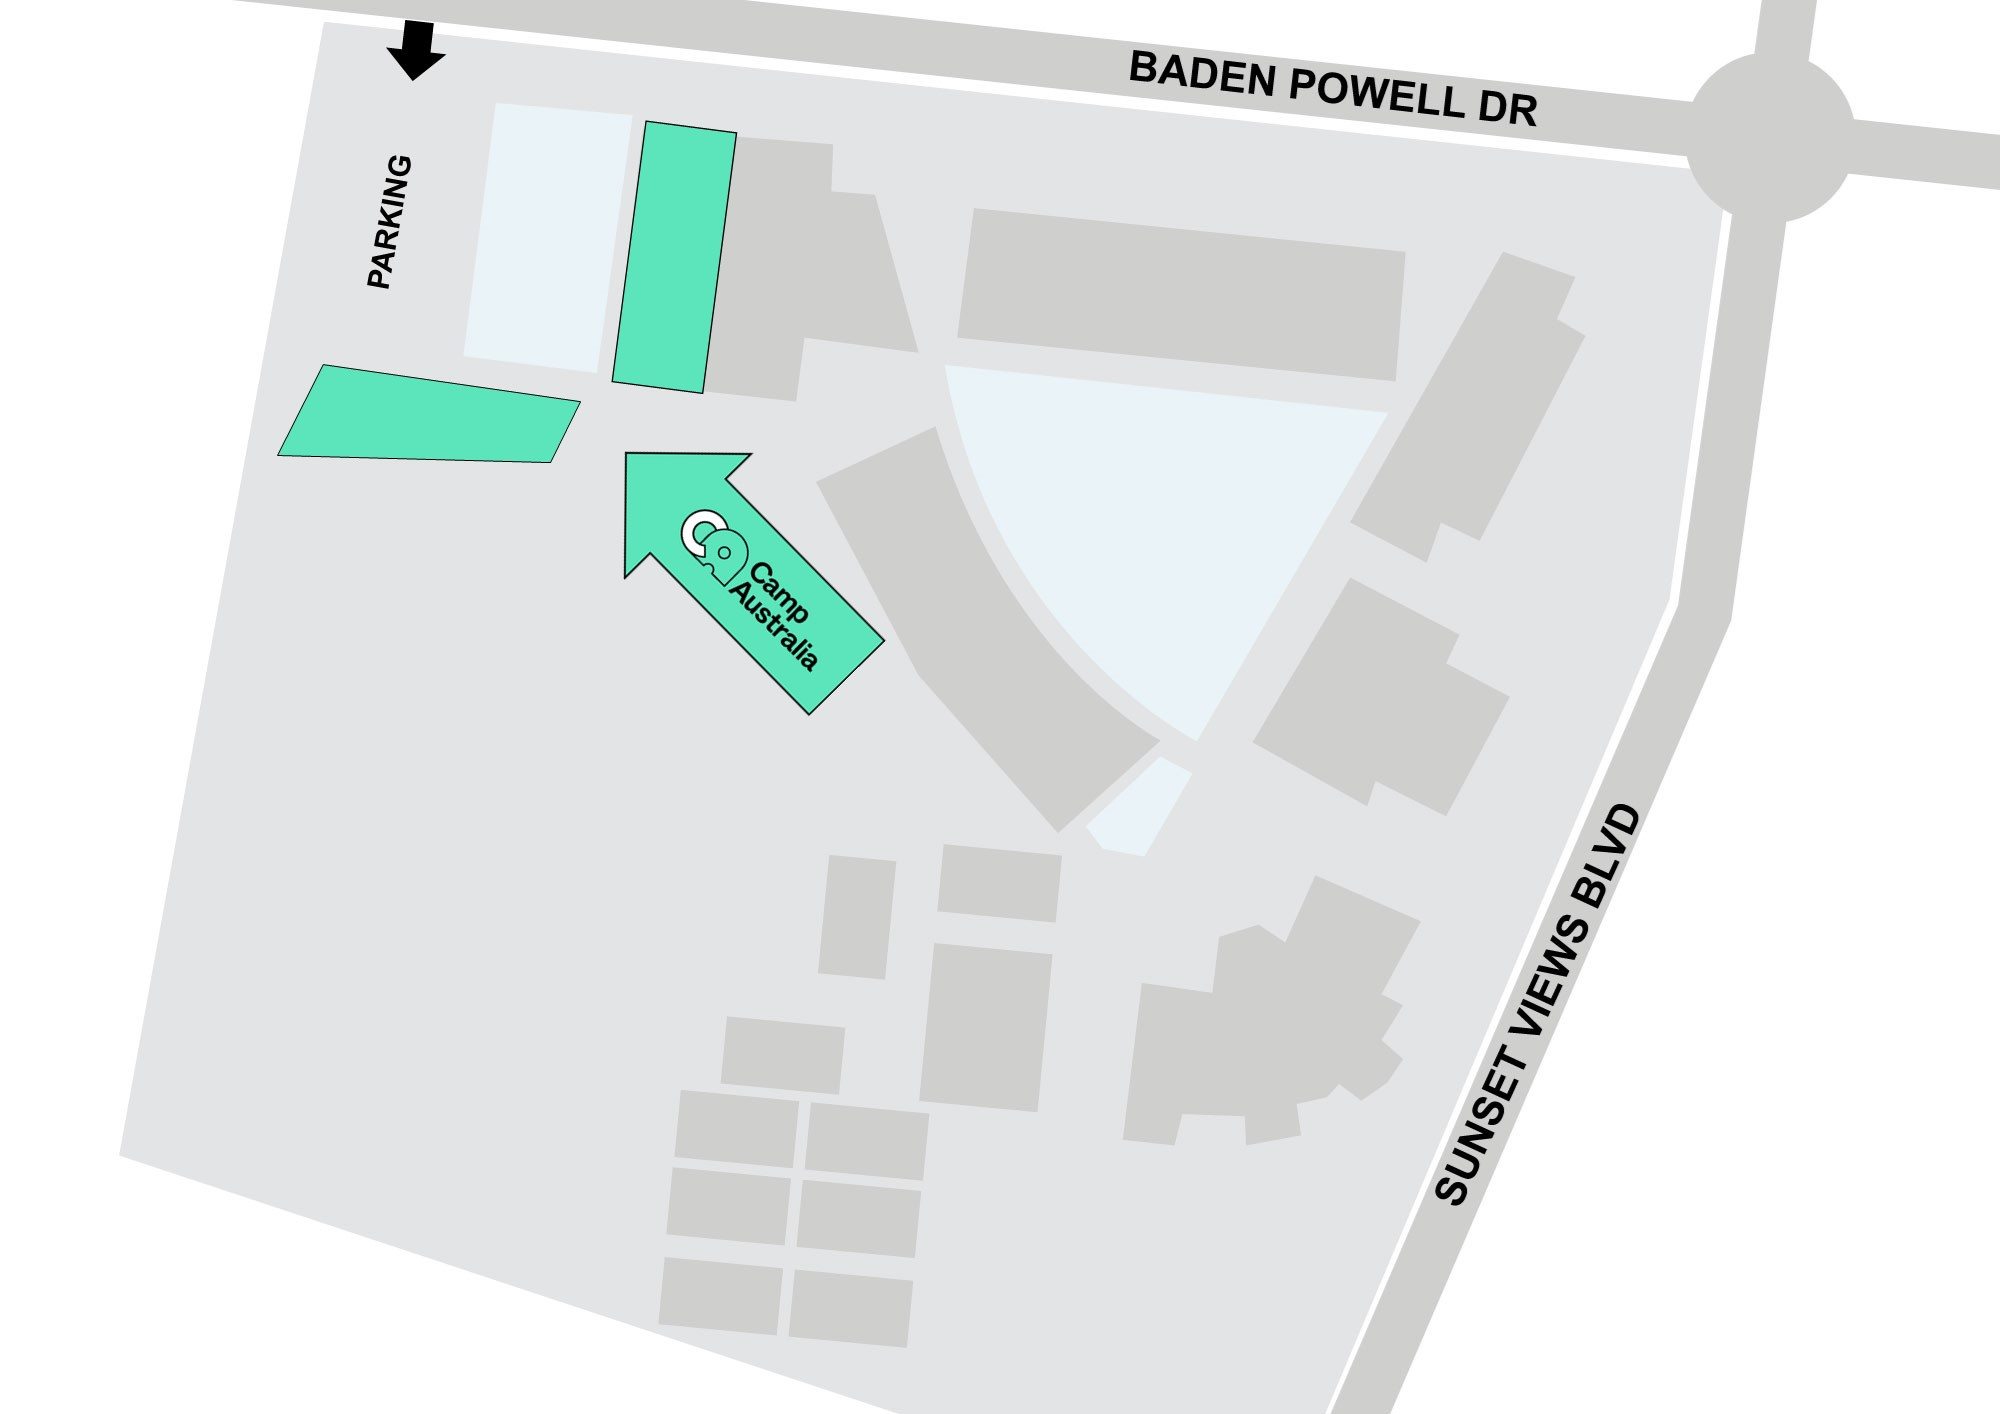 Baden Powell P-9 College - Tarneit Campus